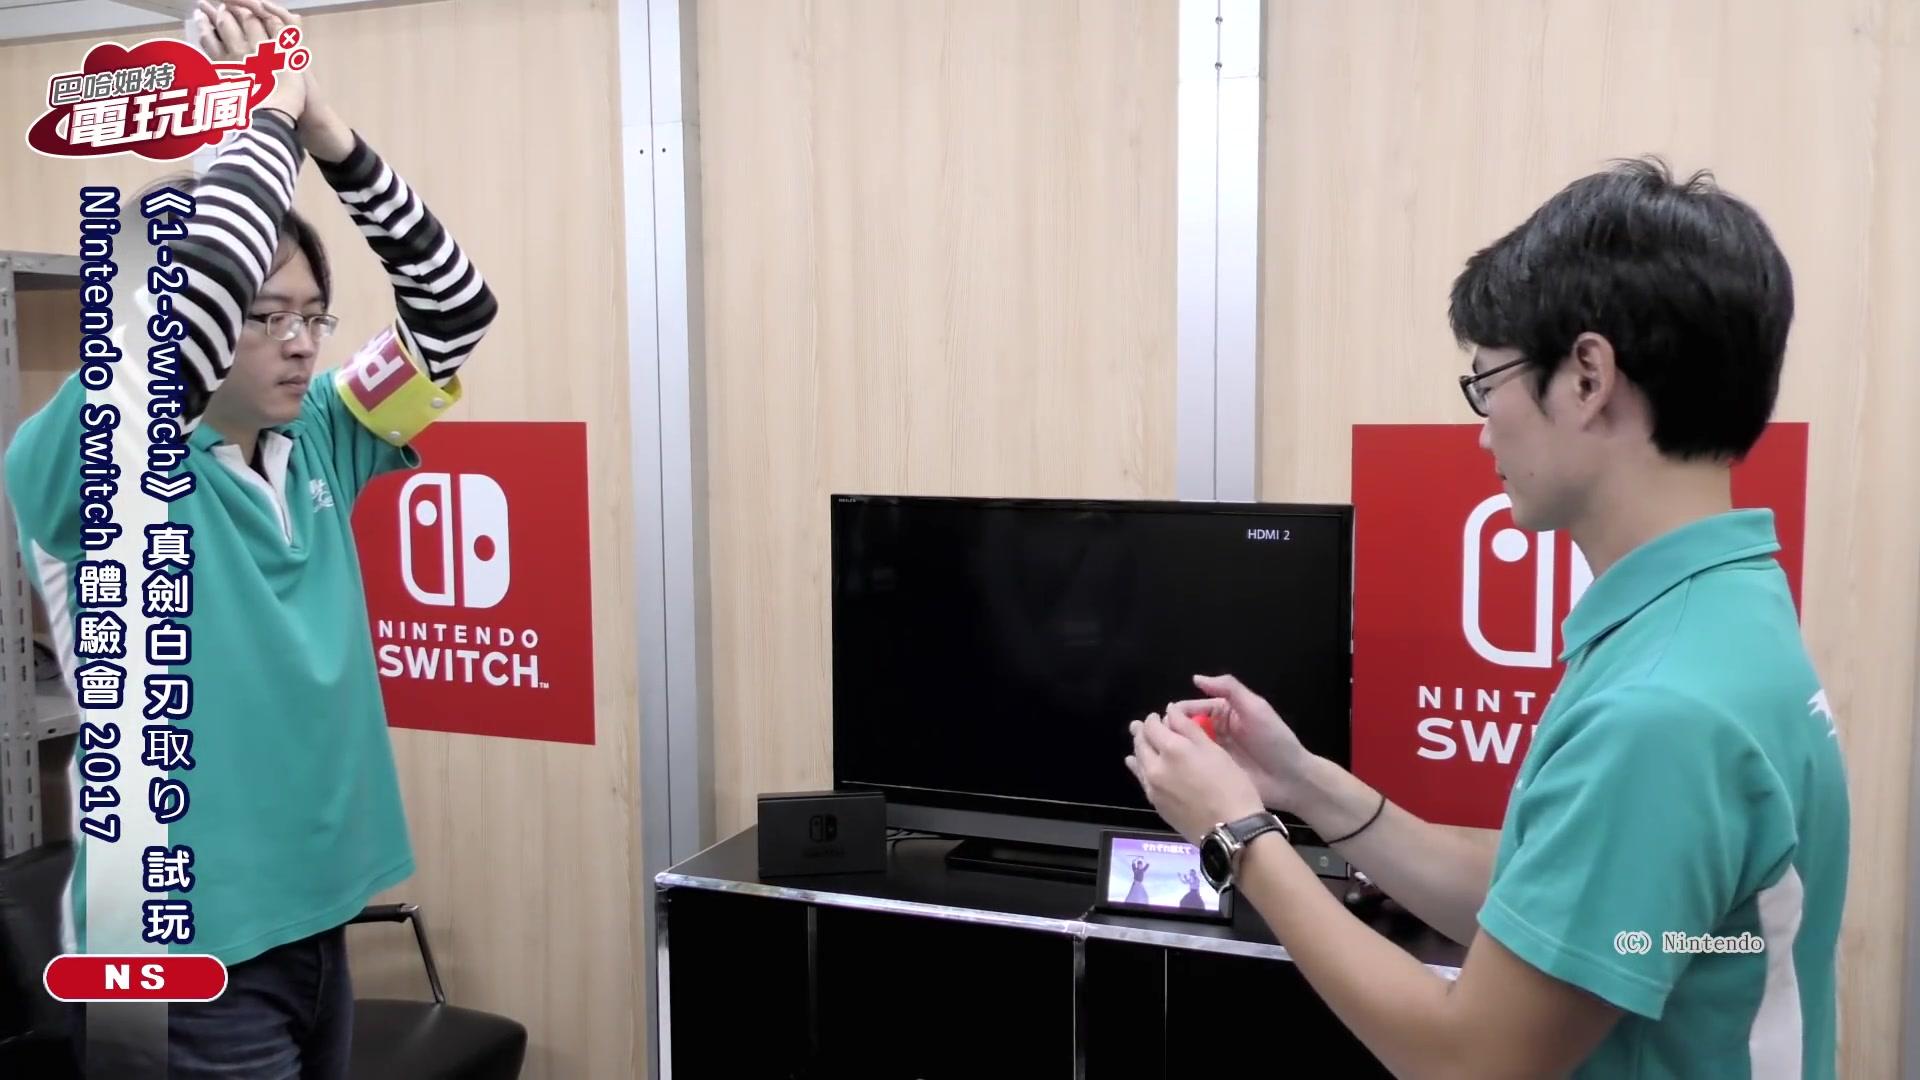 nintendo switch 试玩《1-2-switch》真剑白刃取り!空手入白刃图片